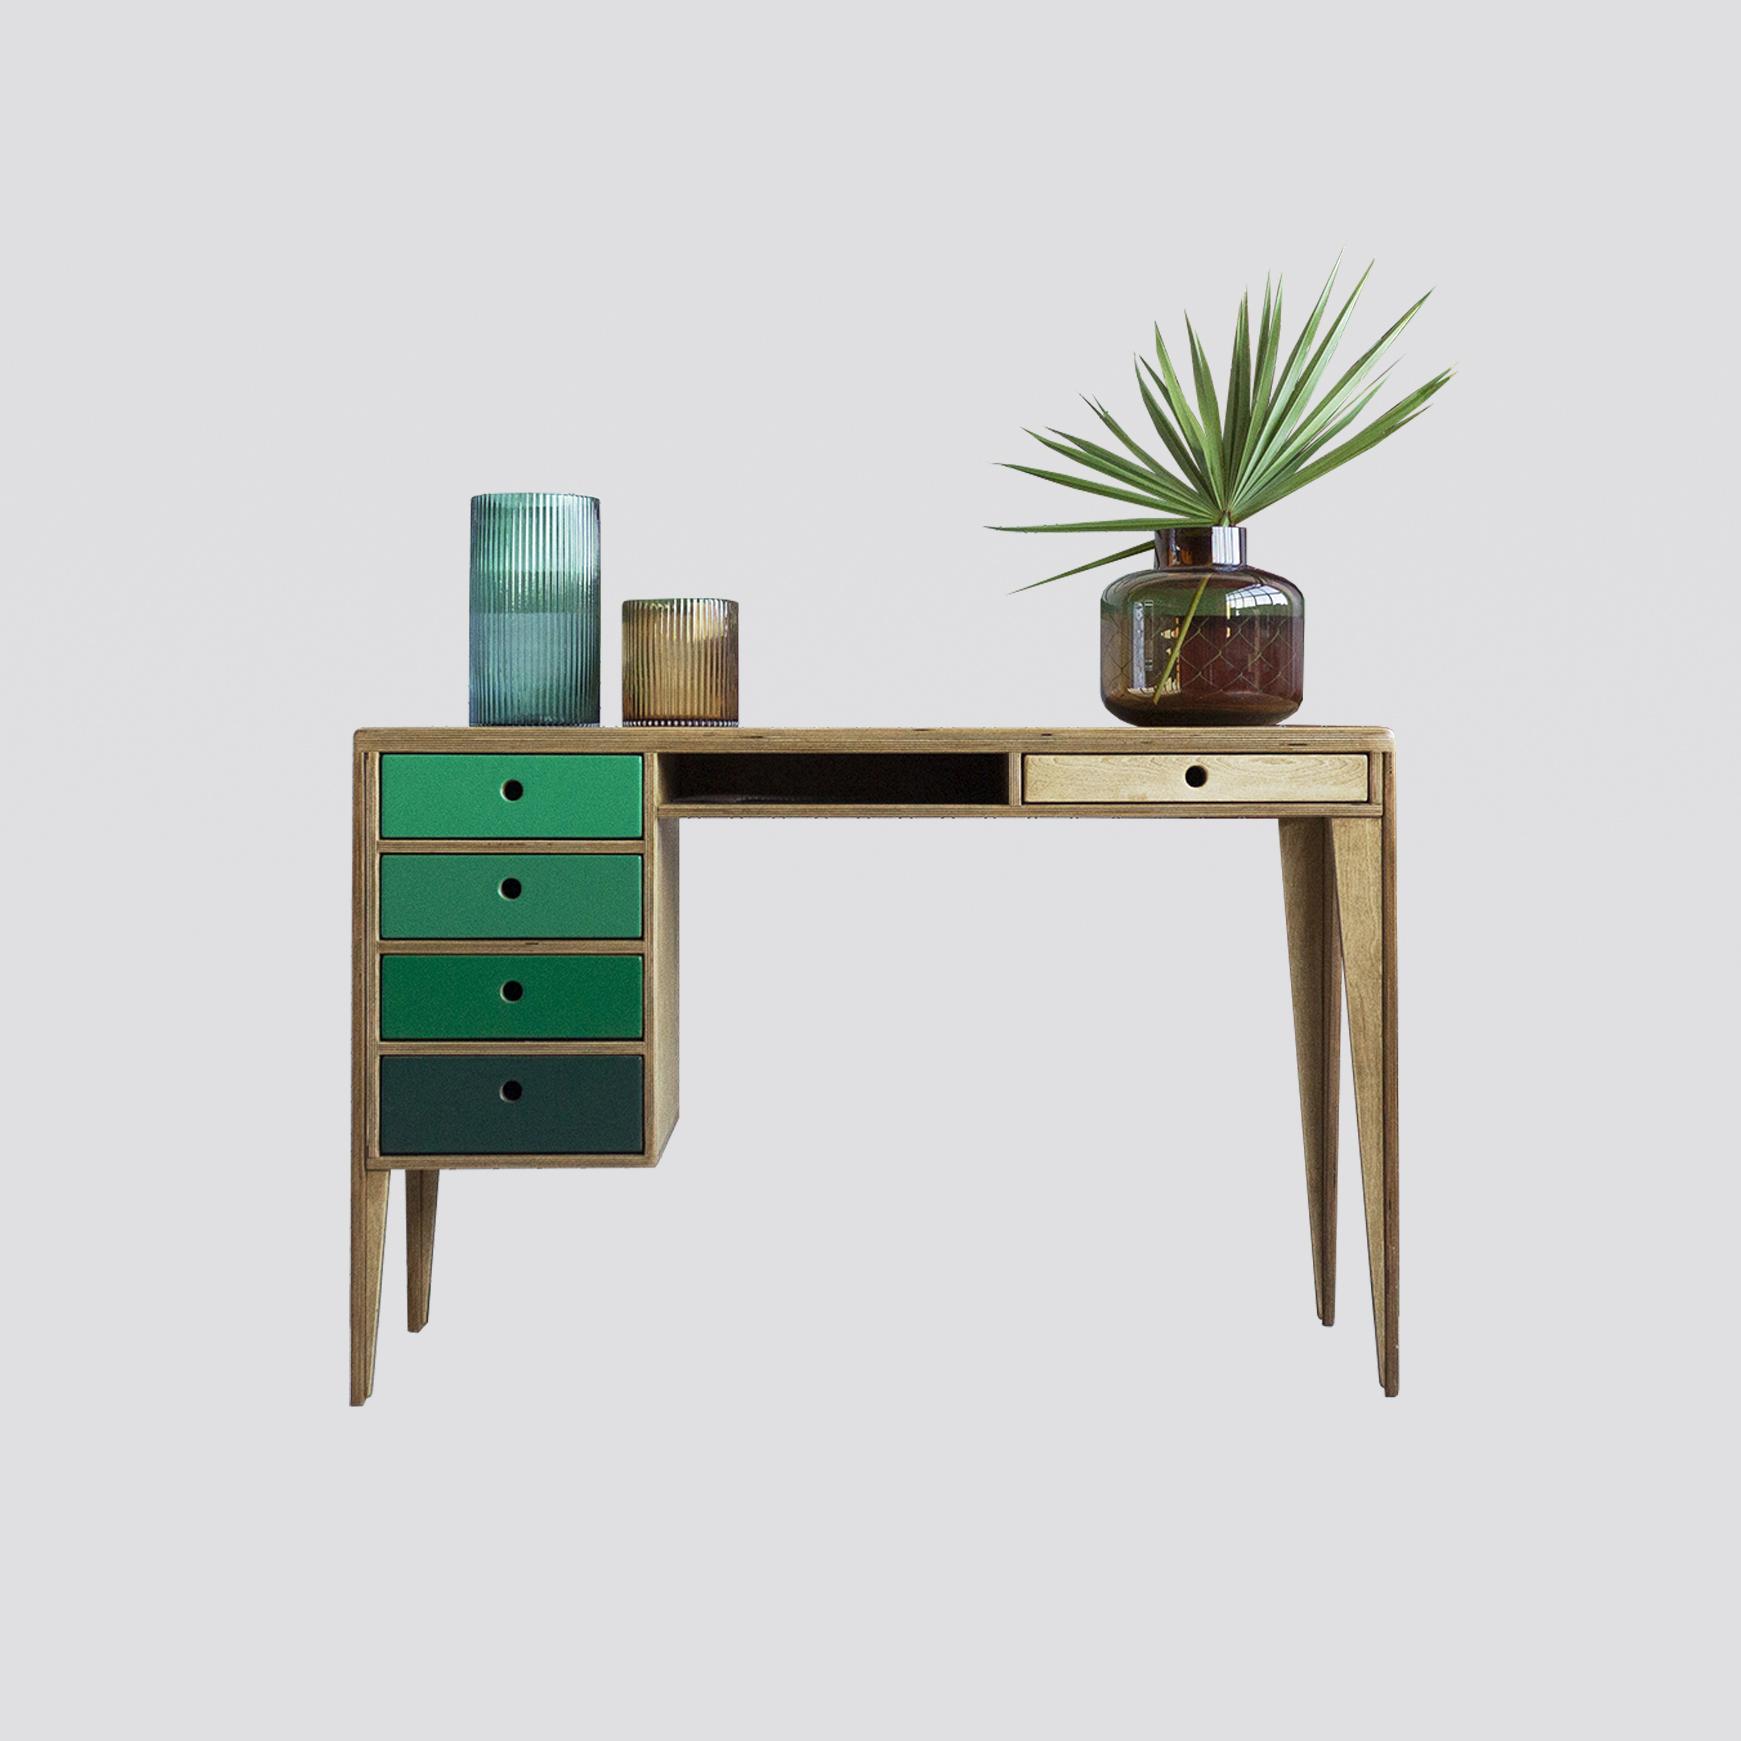 Zdjęcie produktu RUNO.3 biurko